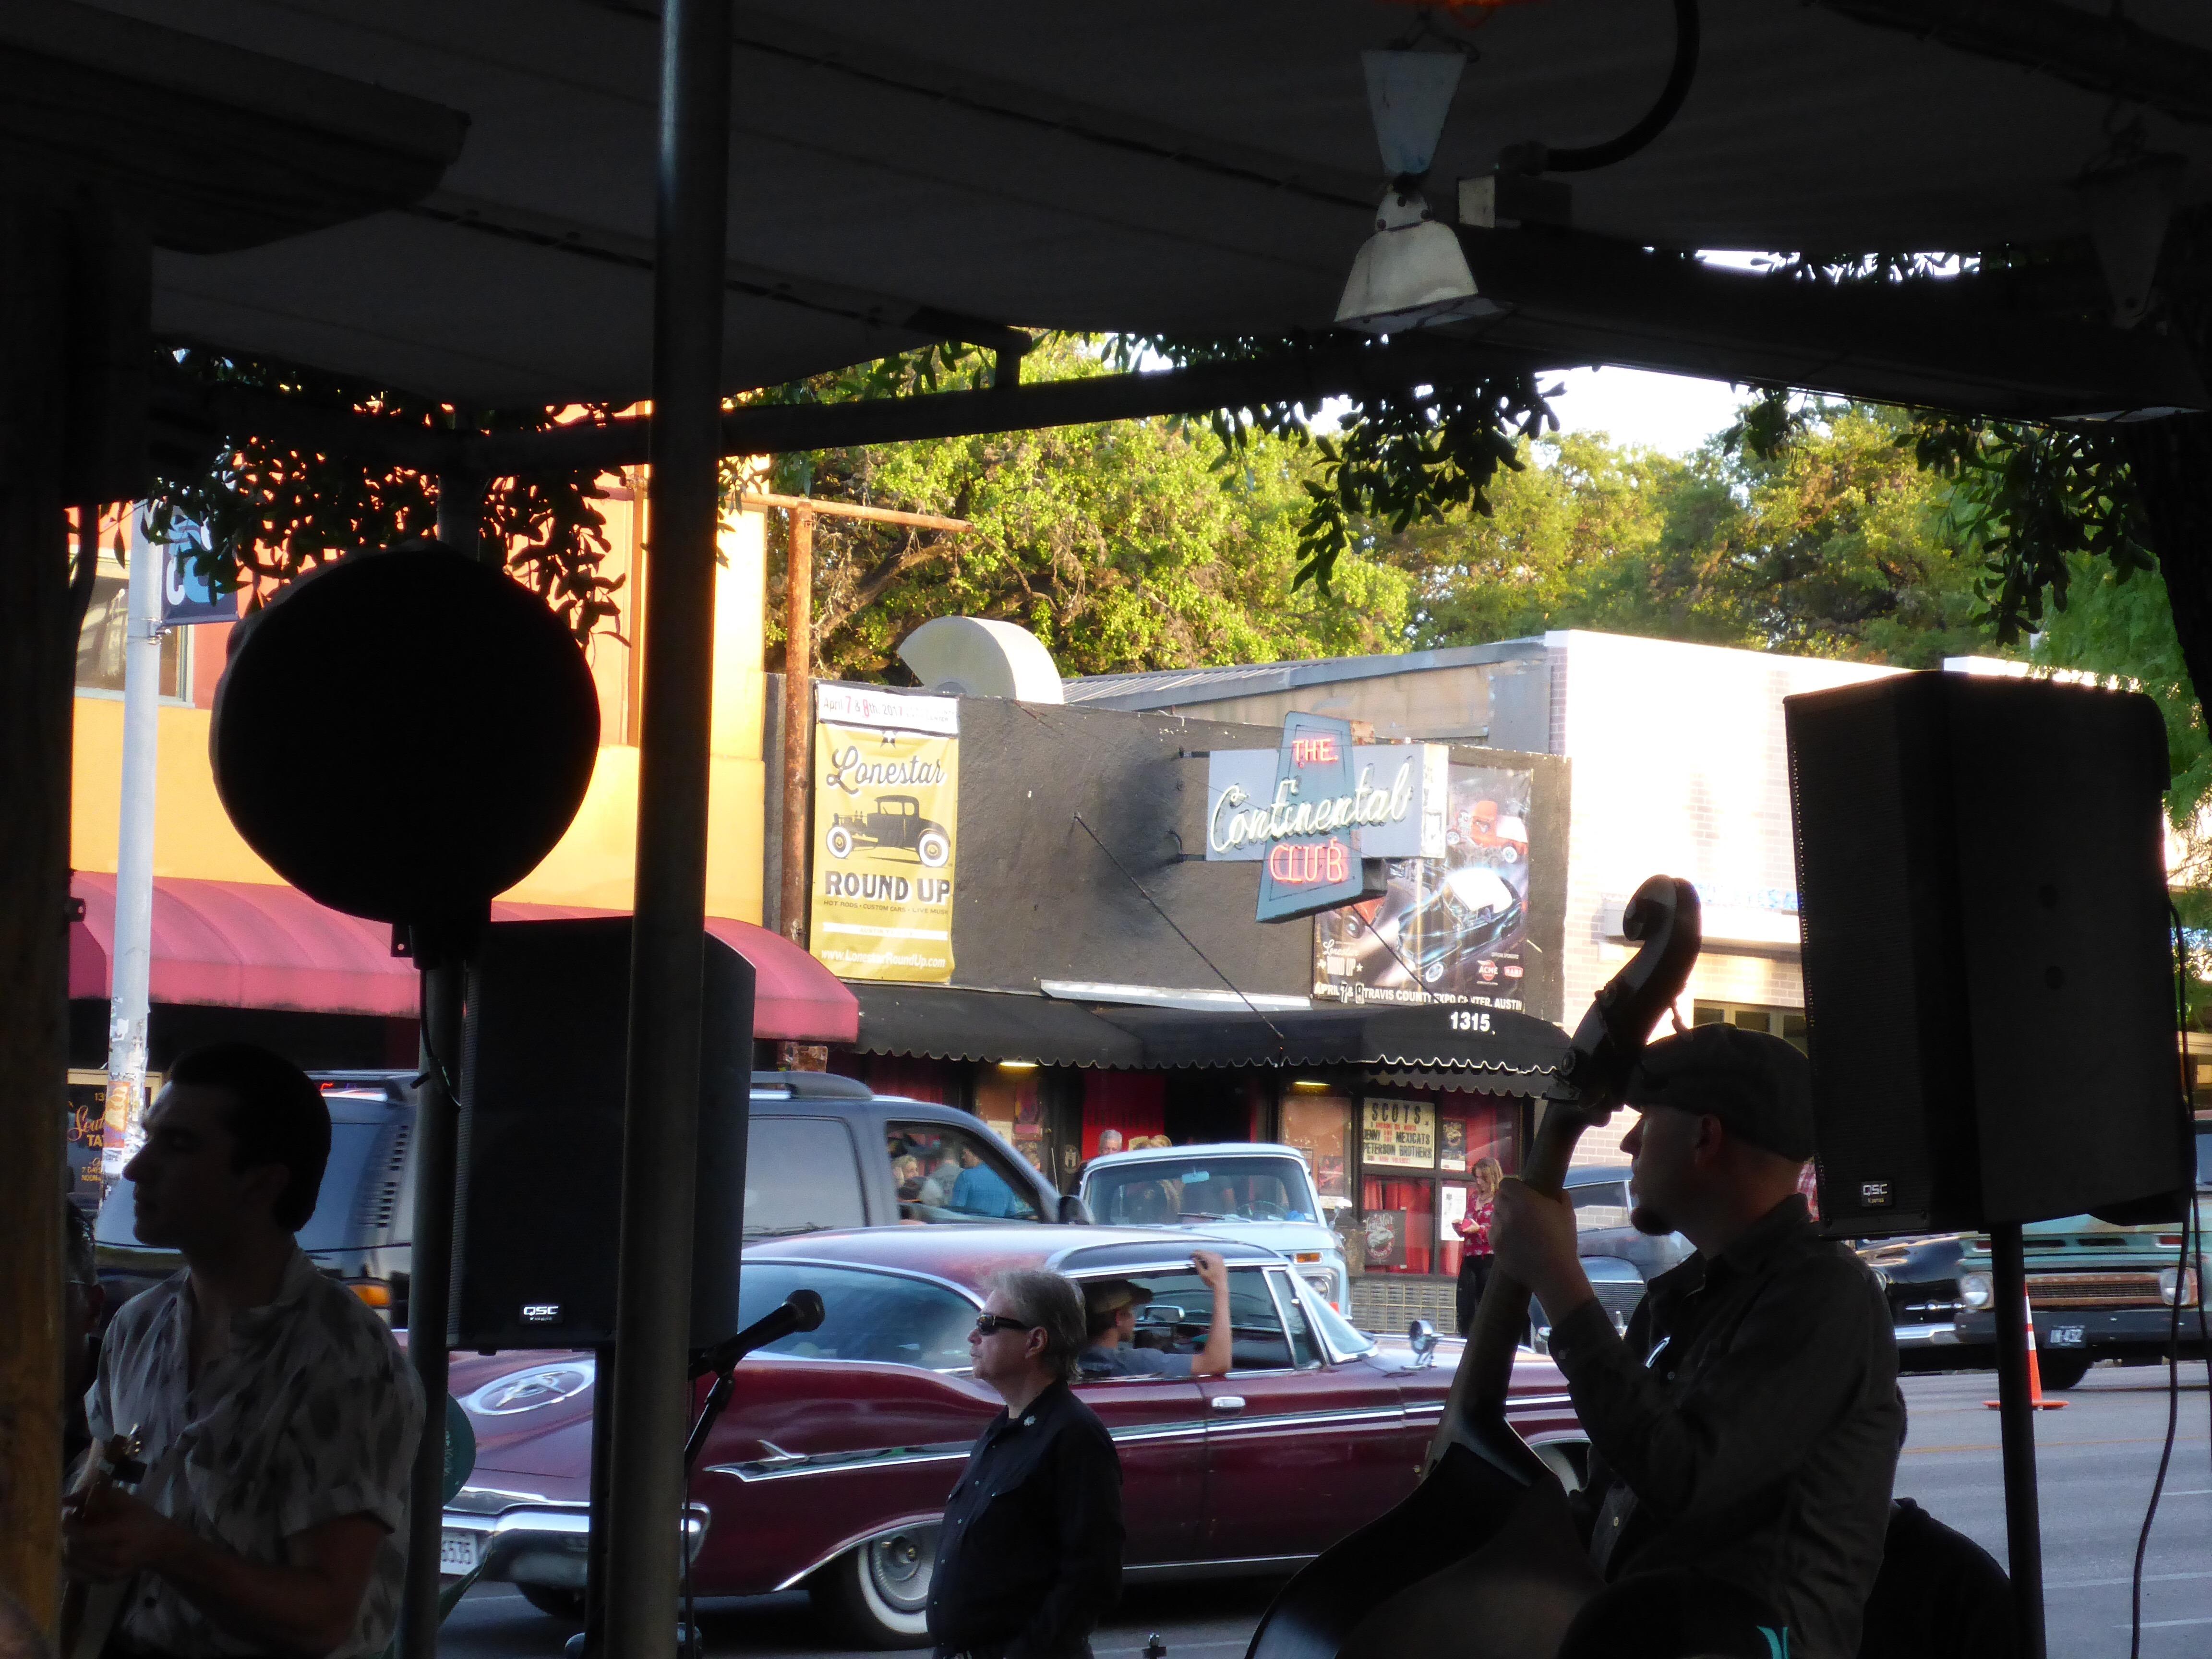 Downtown Earthrobert Page - Travis county expo center car show